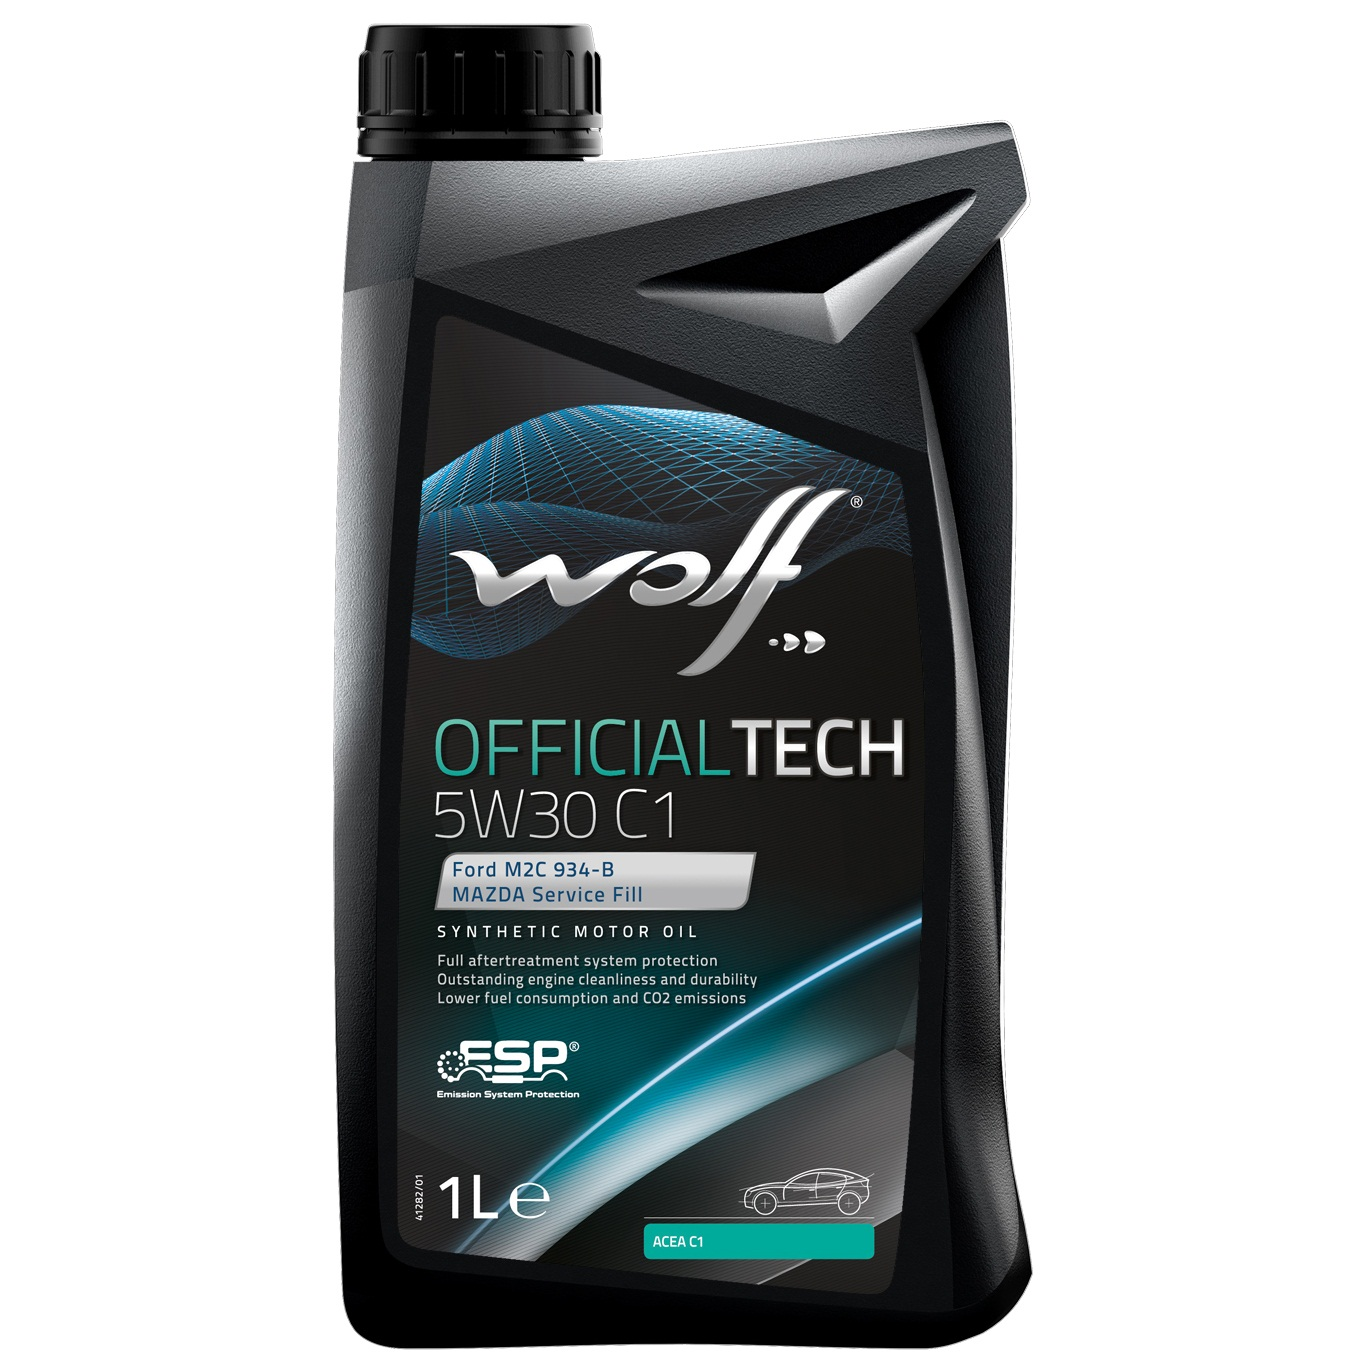 ULEI MOTOR WOLF OFFICIALTECH C1 5W30 1L